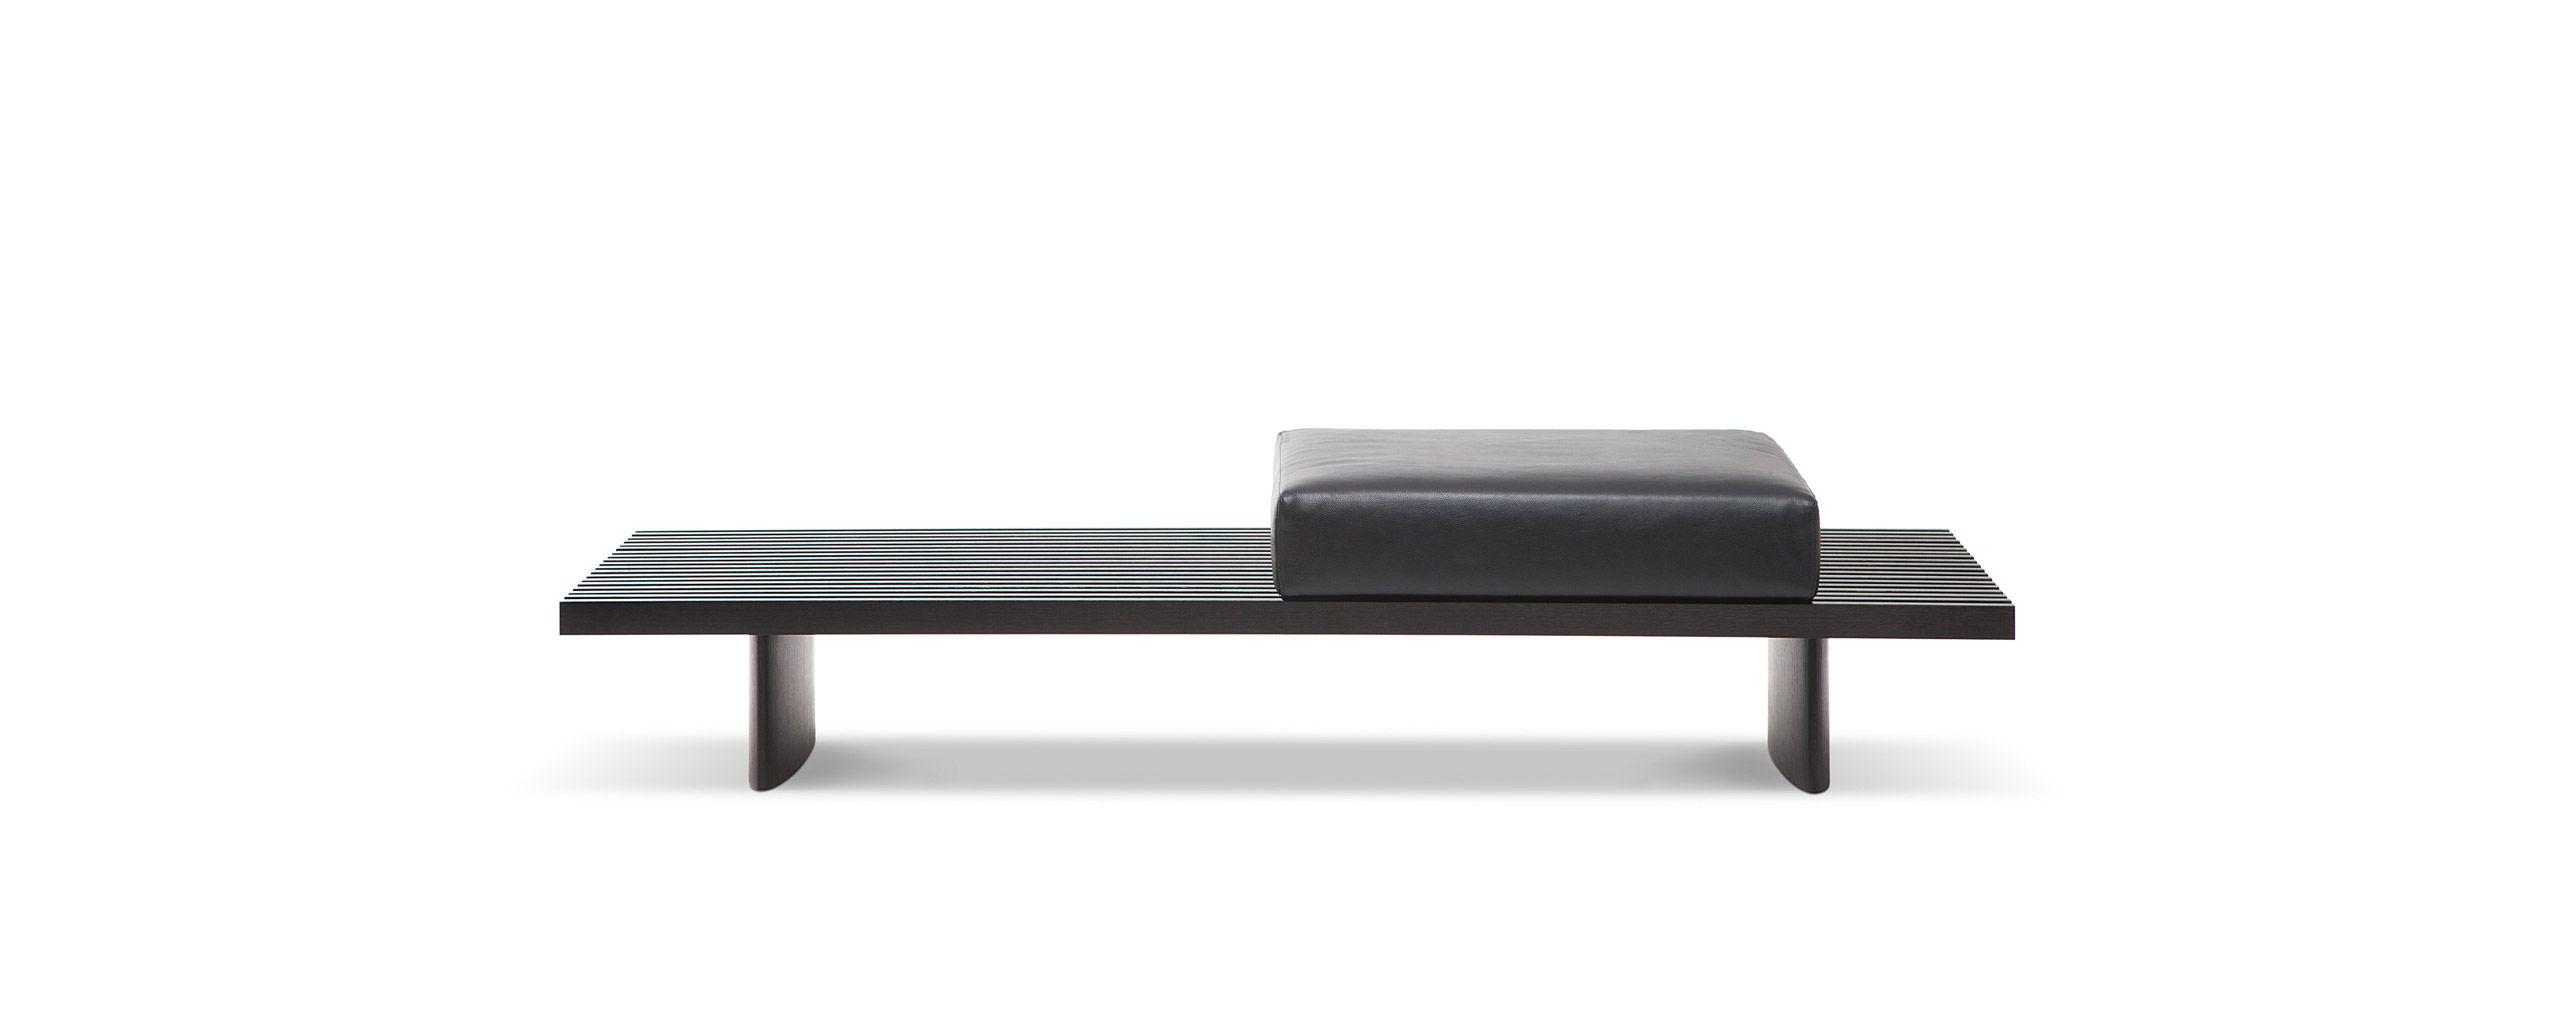 e5a5a55837fcb70841ac0970c226cb82 Incroyable De Table Basse Le Corbusier Concept